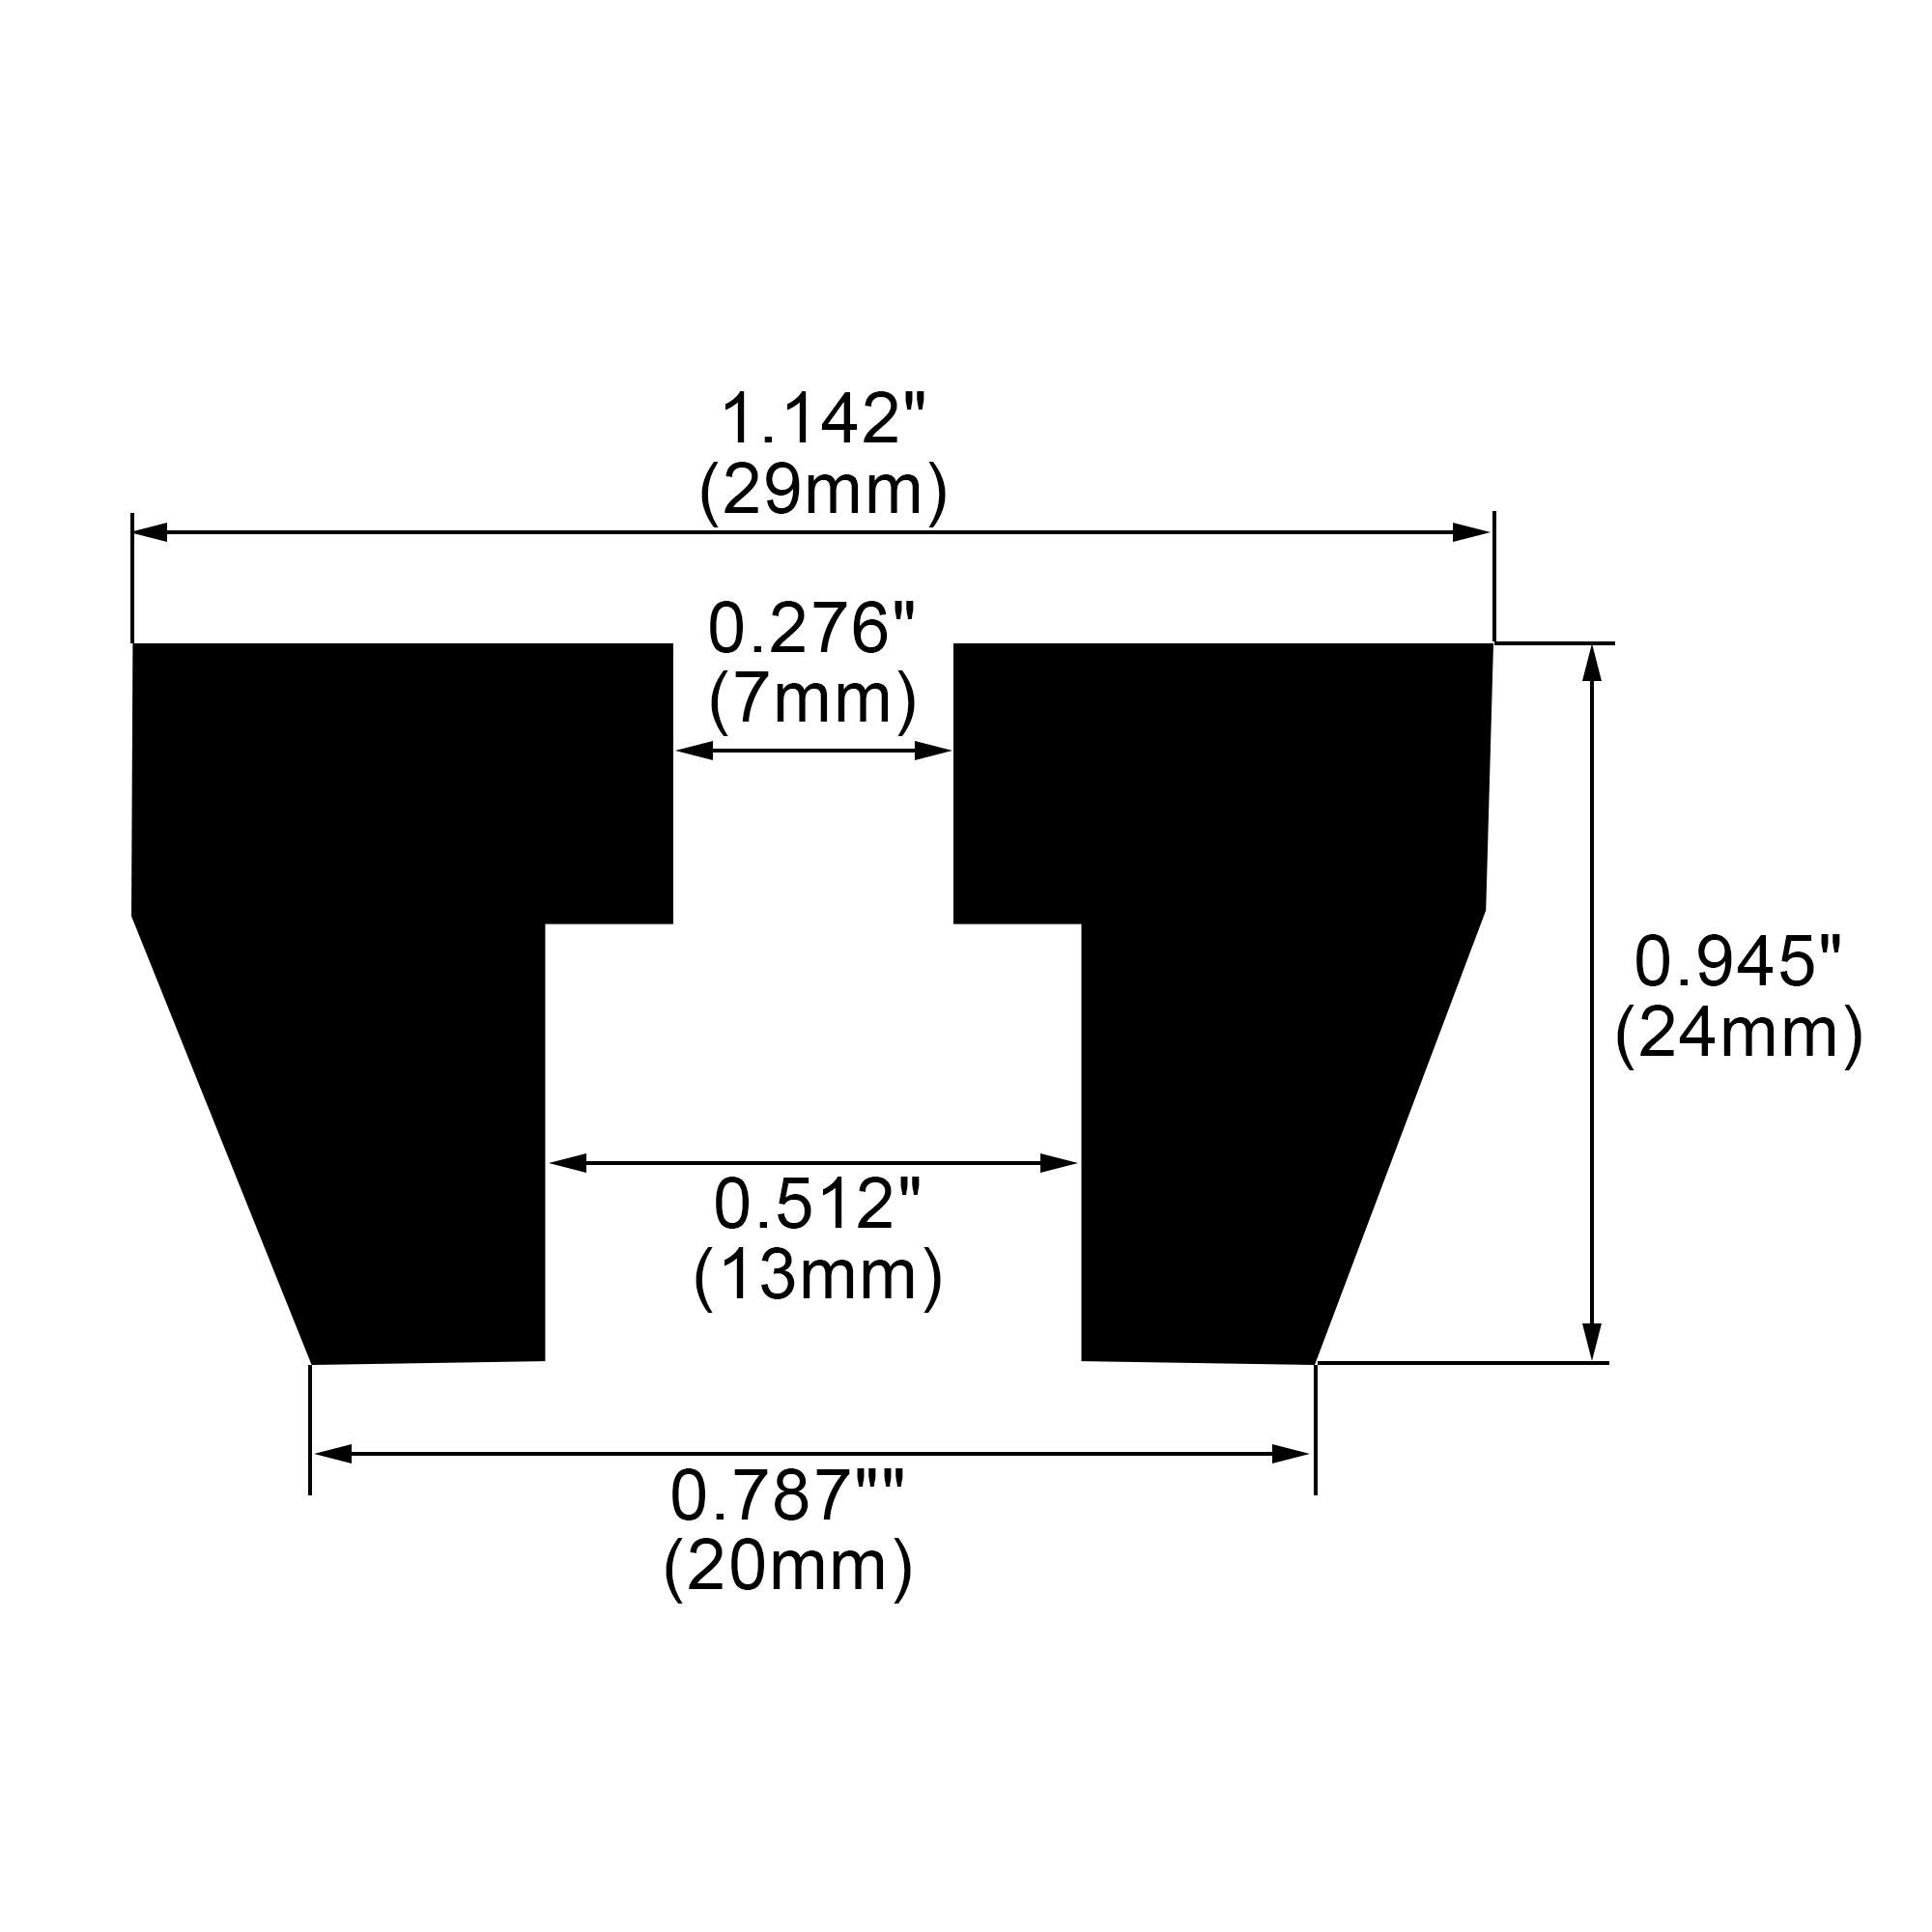 38pcs Rubber Feet Bumper Furniture Table Amplifier Speaker Desk Leg Pads, D29x20xH24mm - image 2 of 7